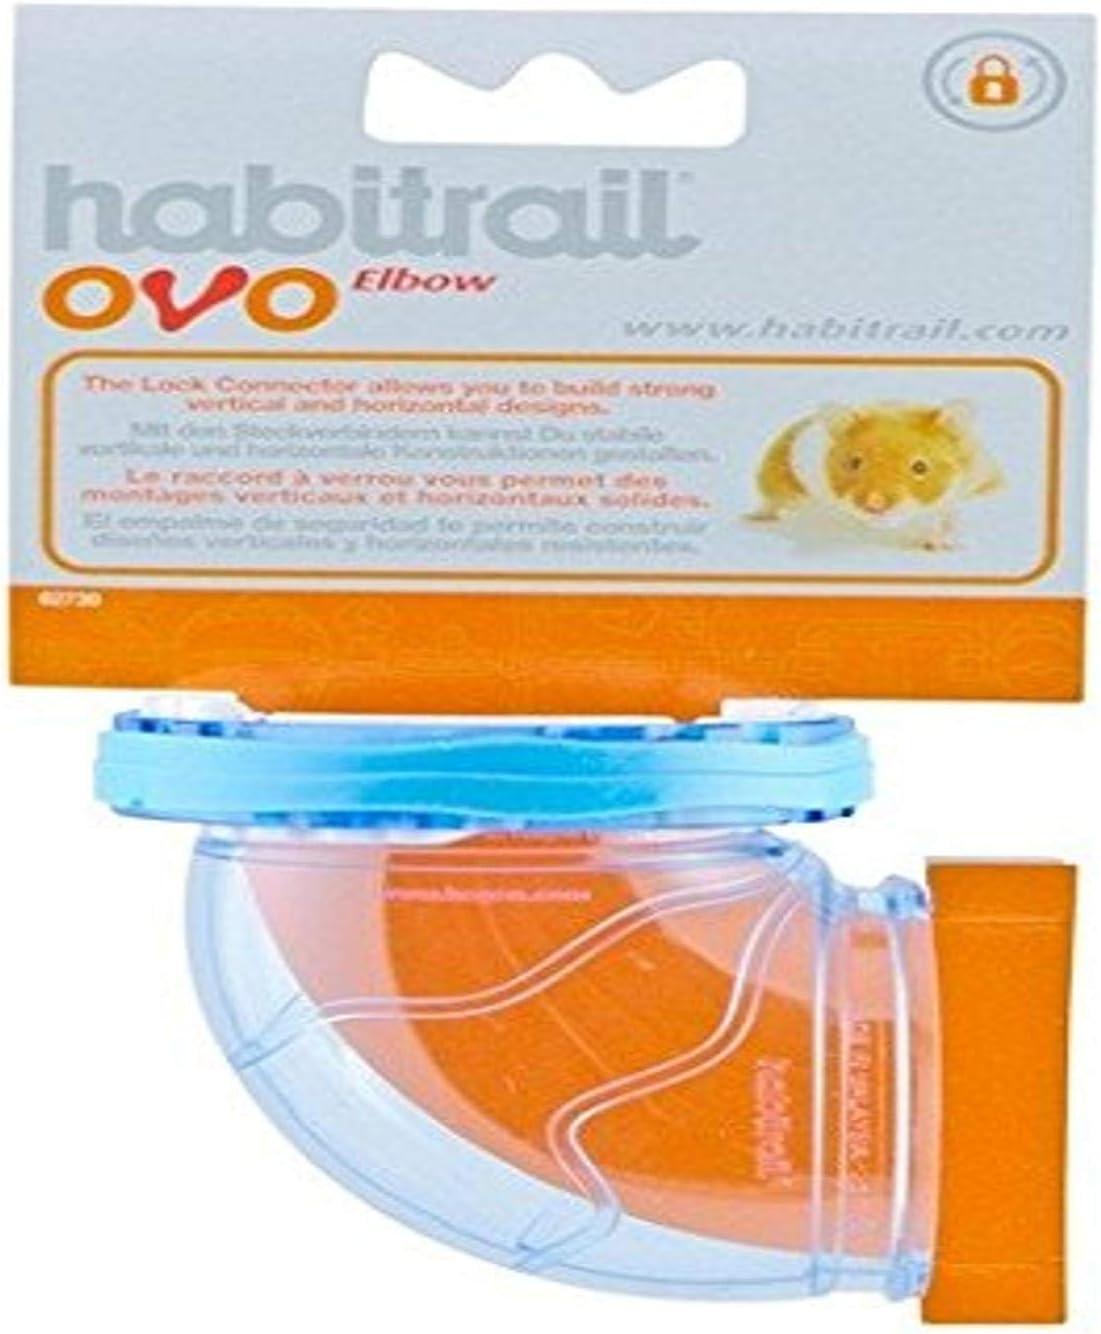 Habitrail Ovo Pet Habitat